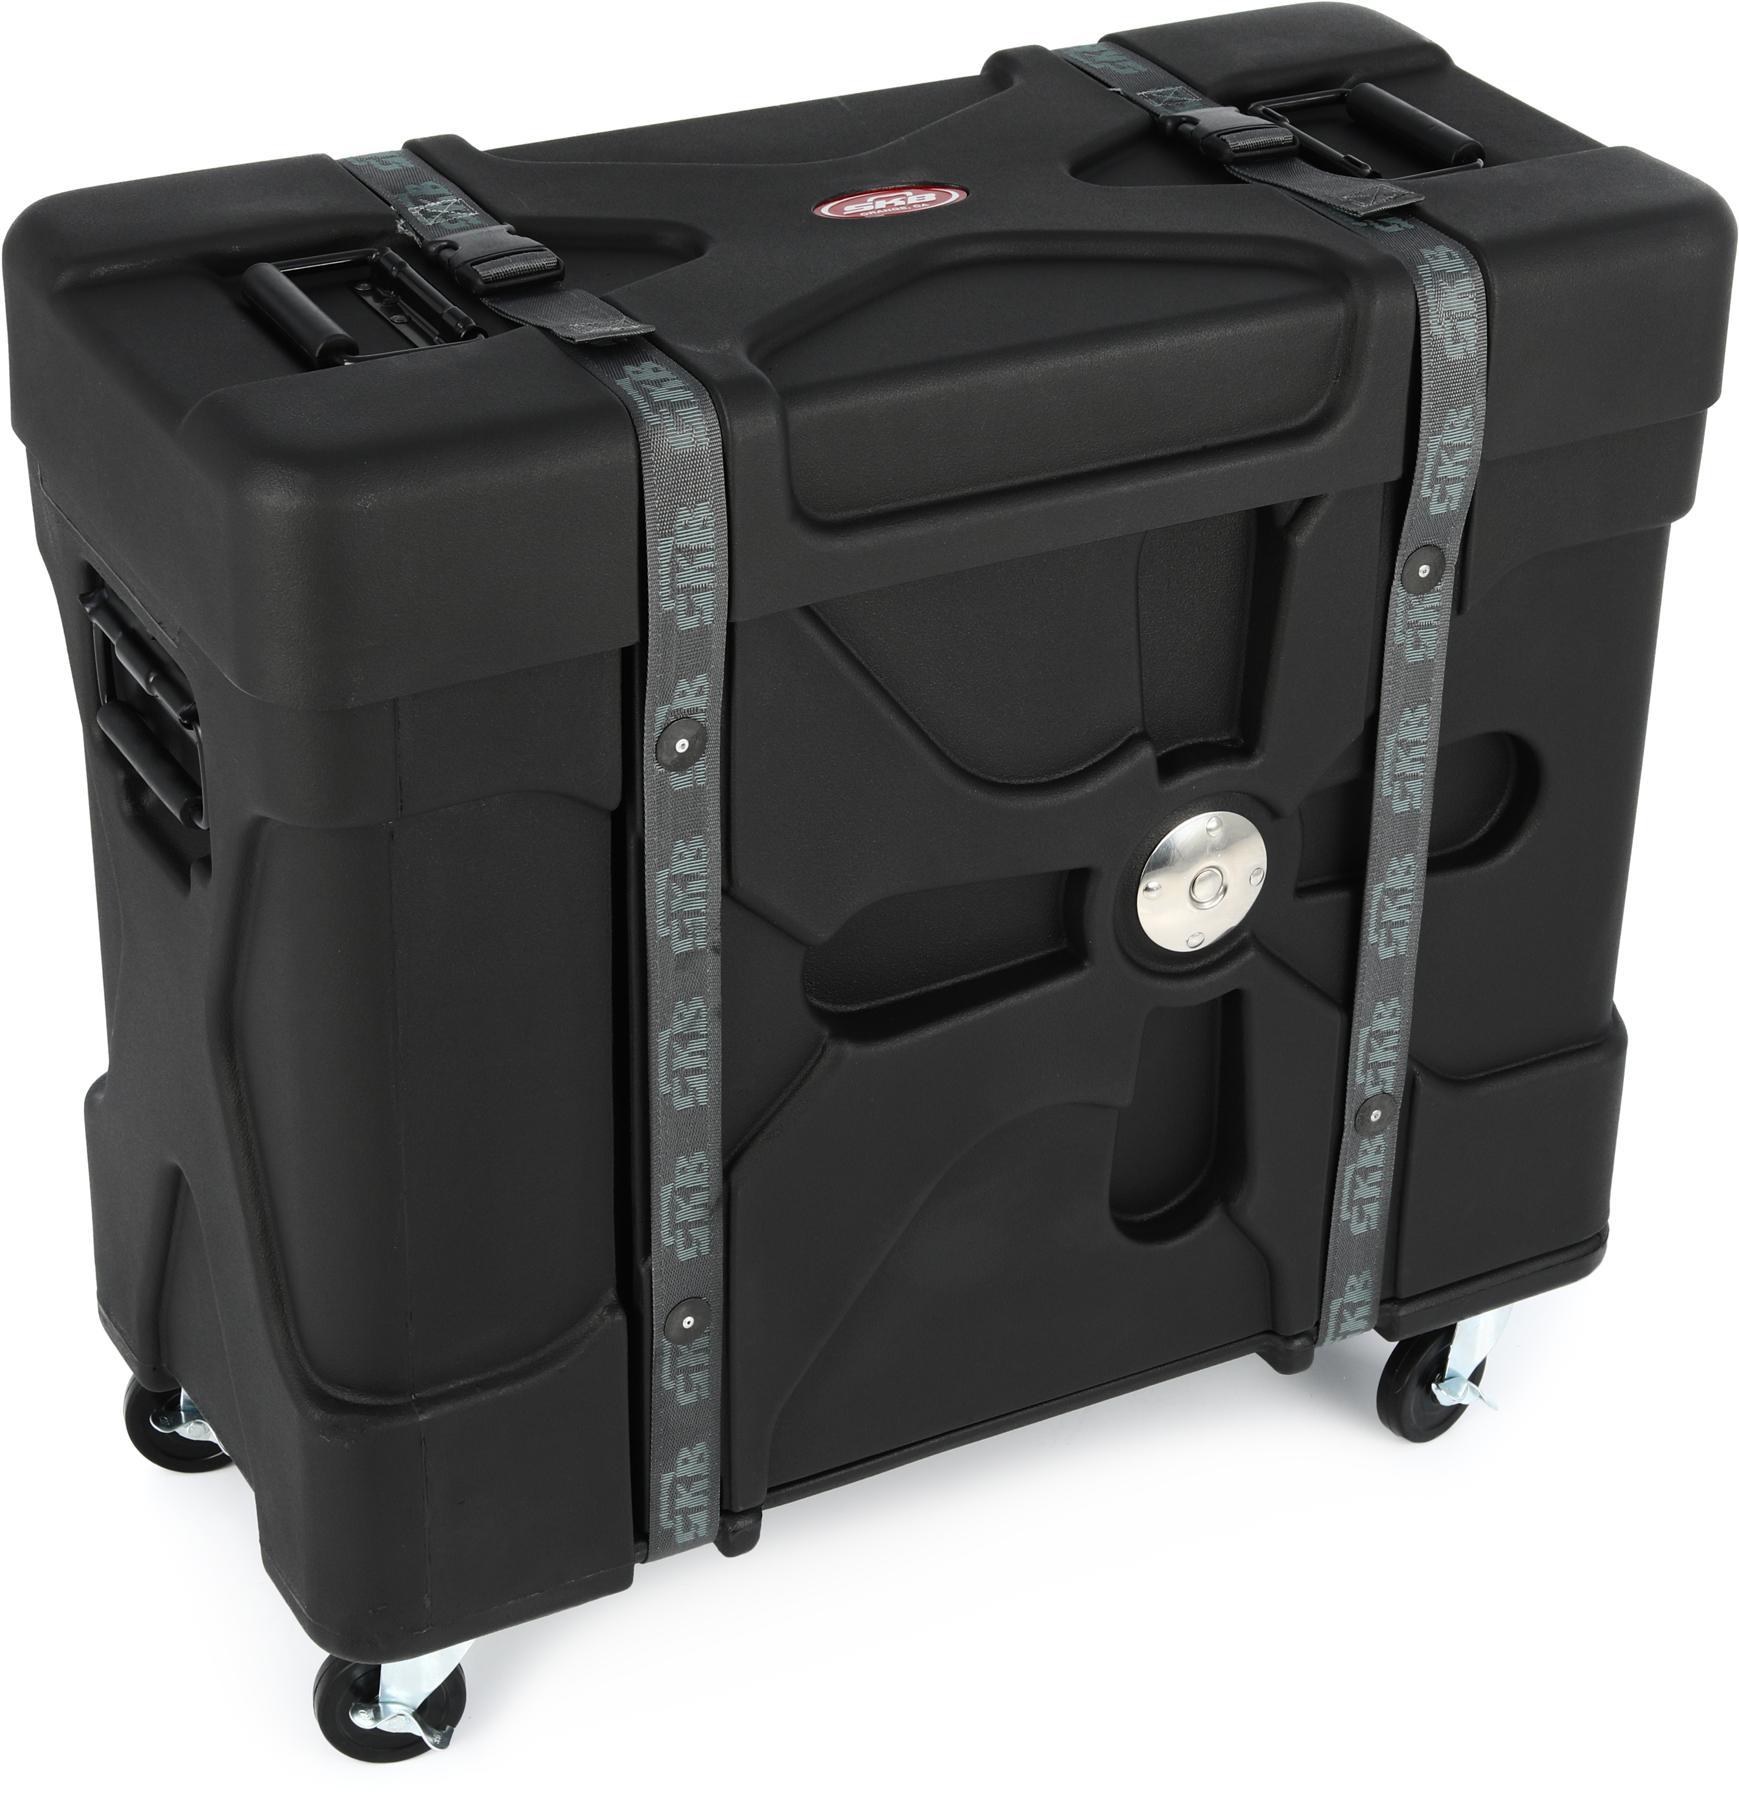 SKB Trap X2 Drum Case